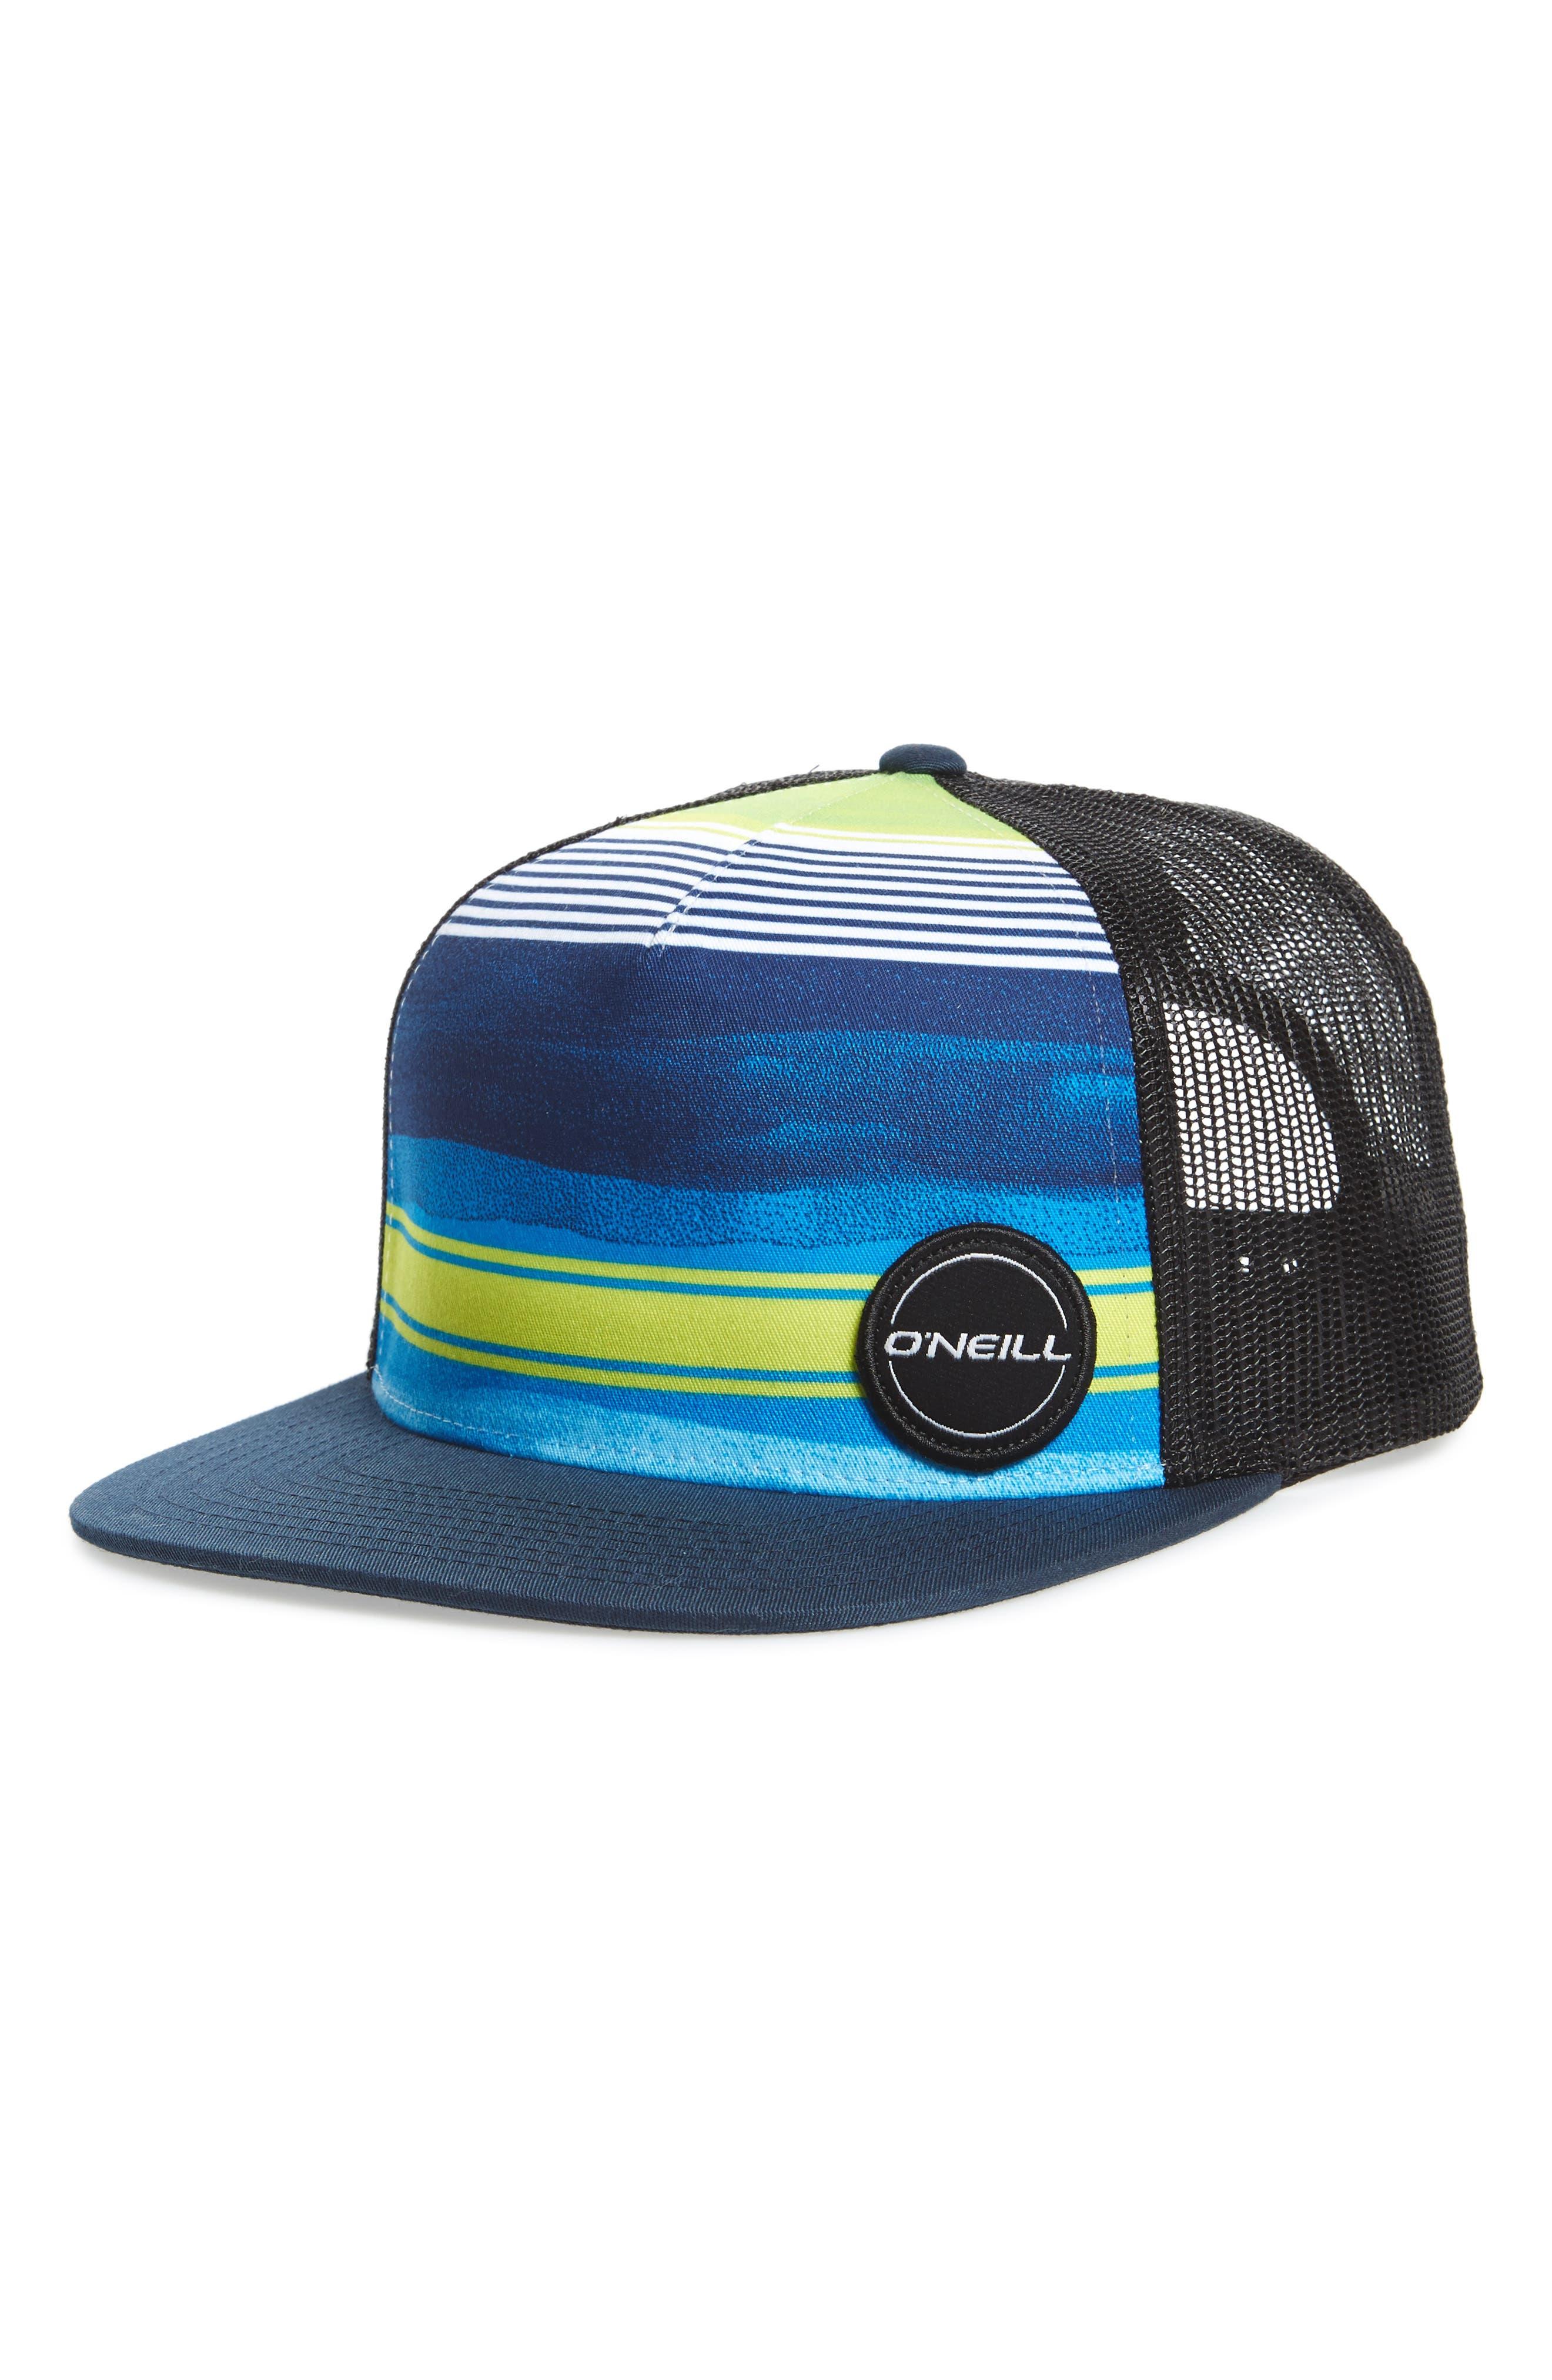 Hyperfreak Mesh Snapback Trucker Cap,                         Main,                         color, Neon Green